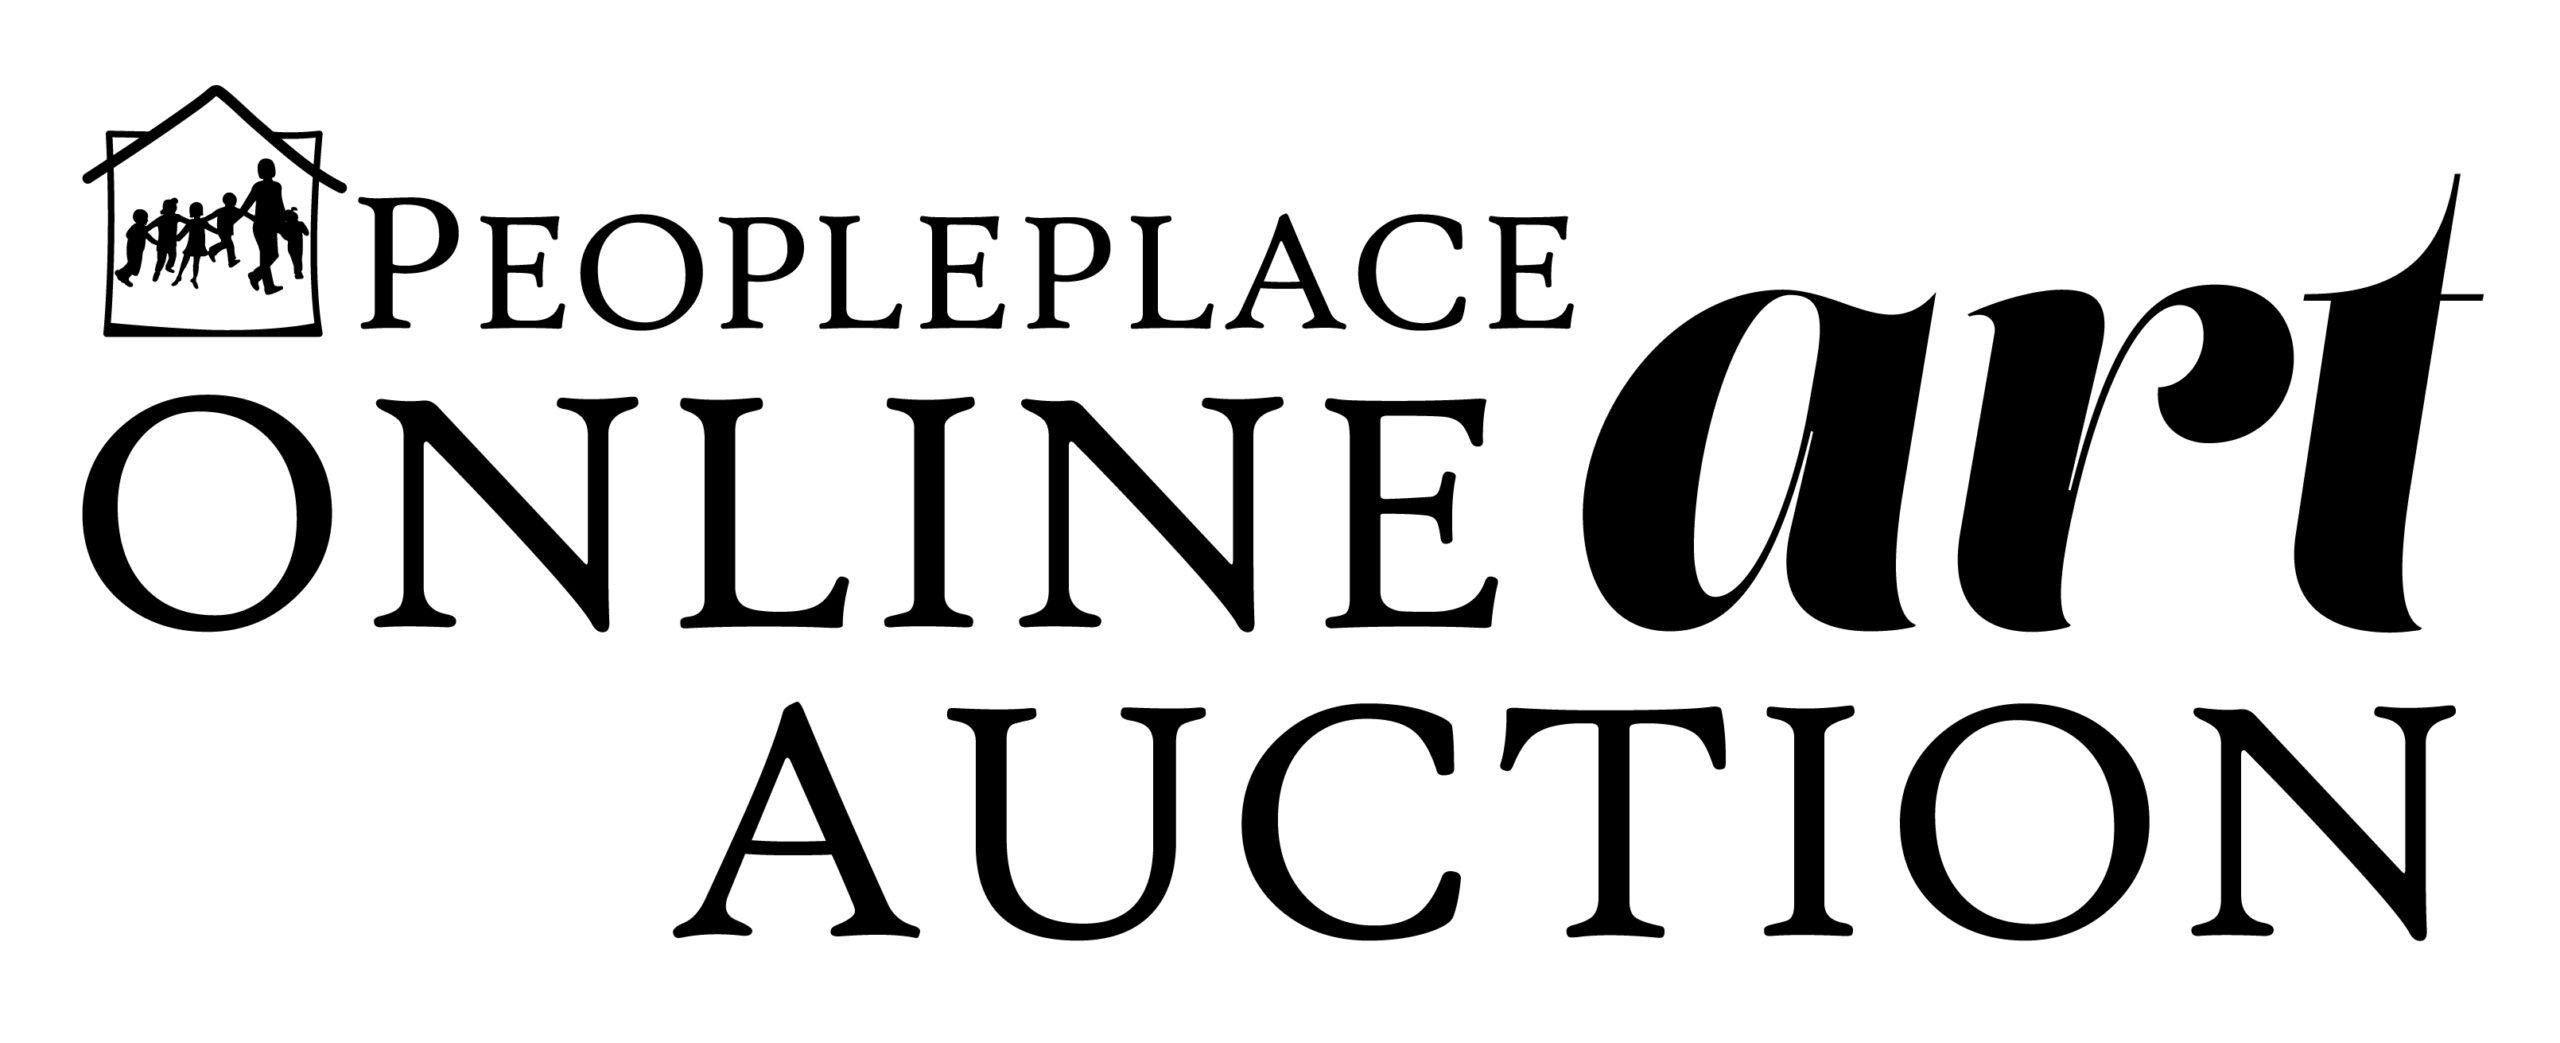 Peopleplace_Logo_2021 Art AuctionL